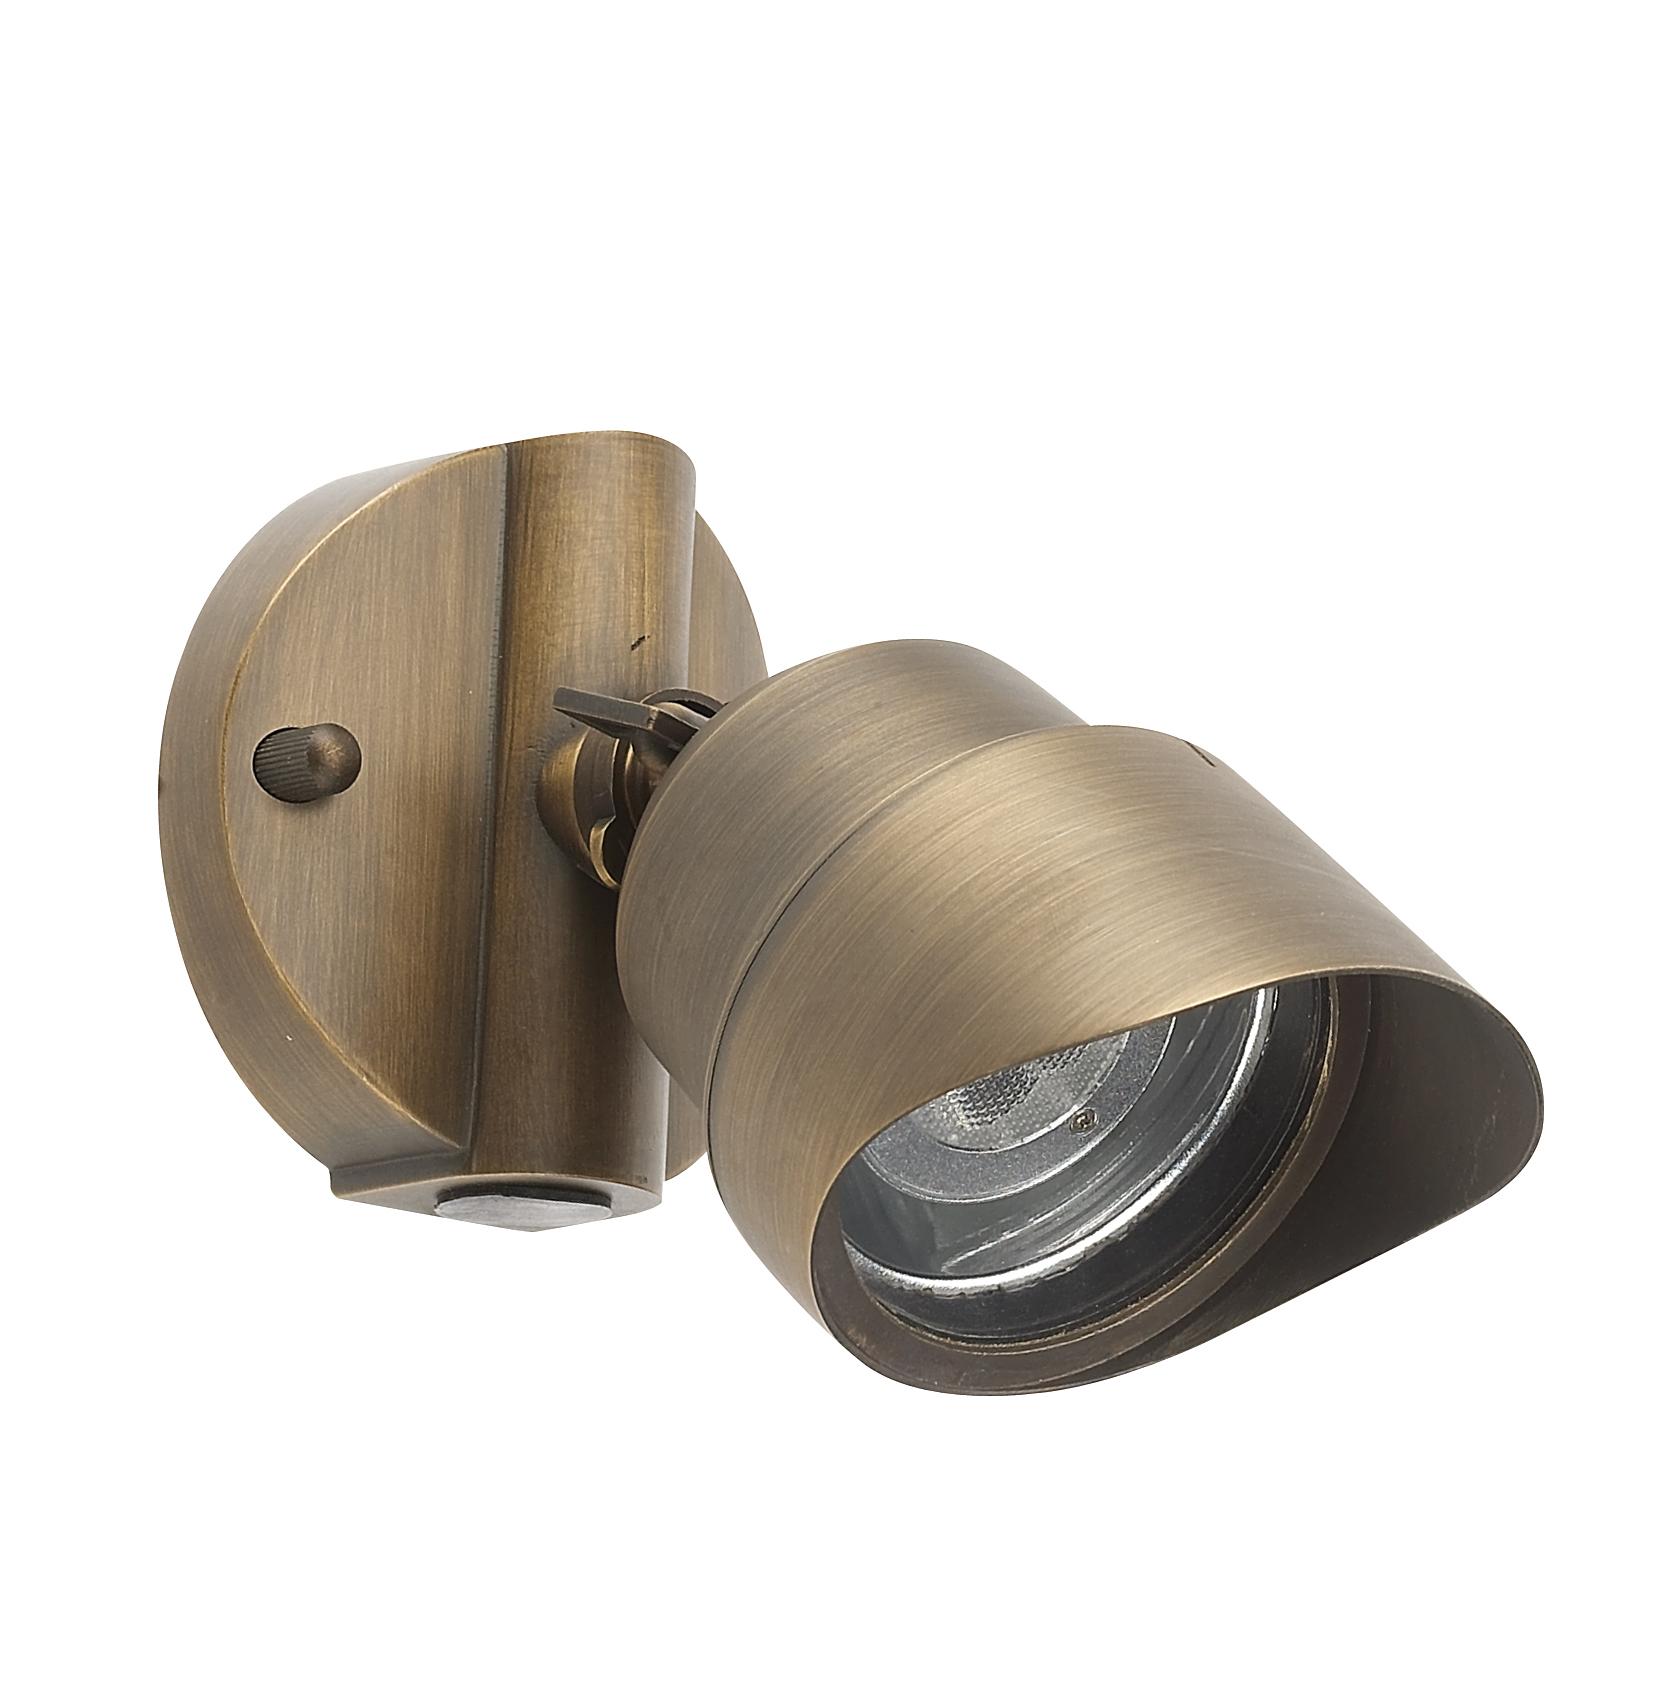 Best Quality Lighting (BQL) Die Cast Brass LV71 Tucson